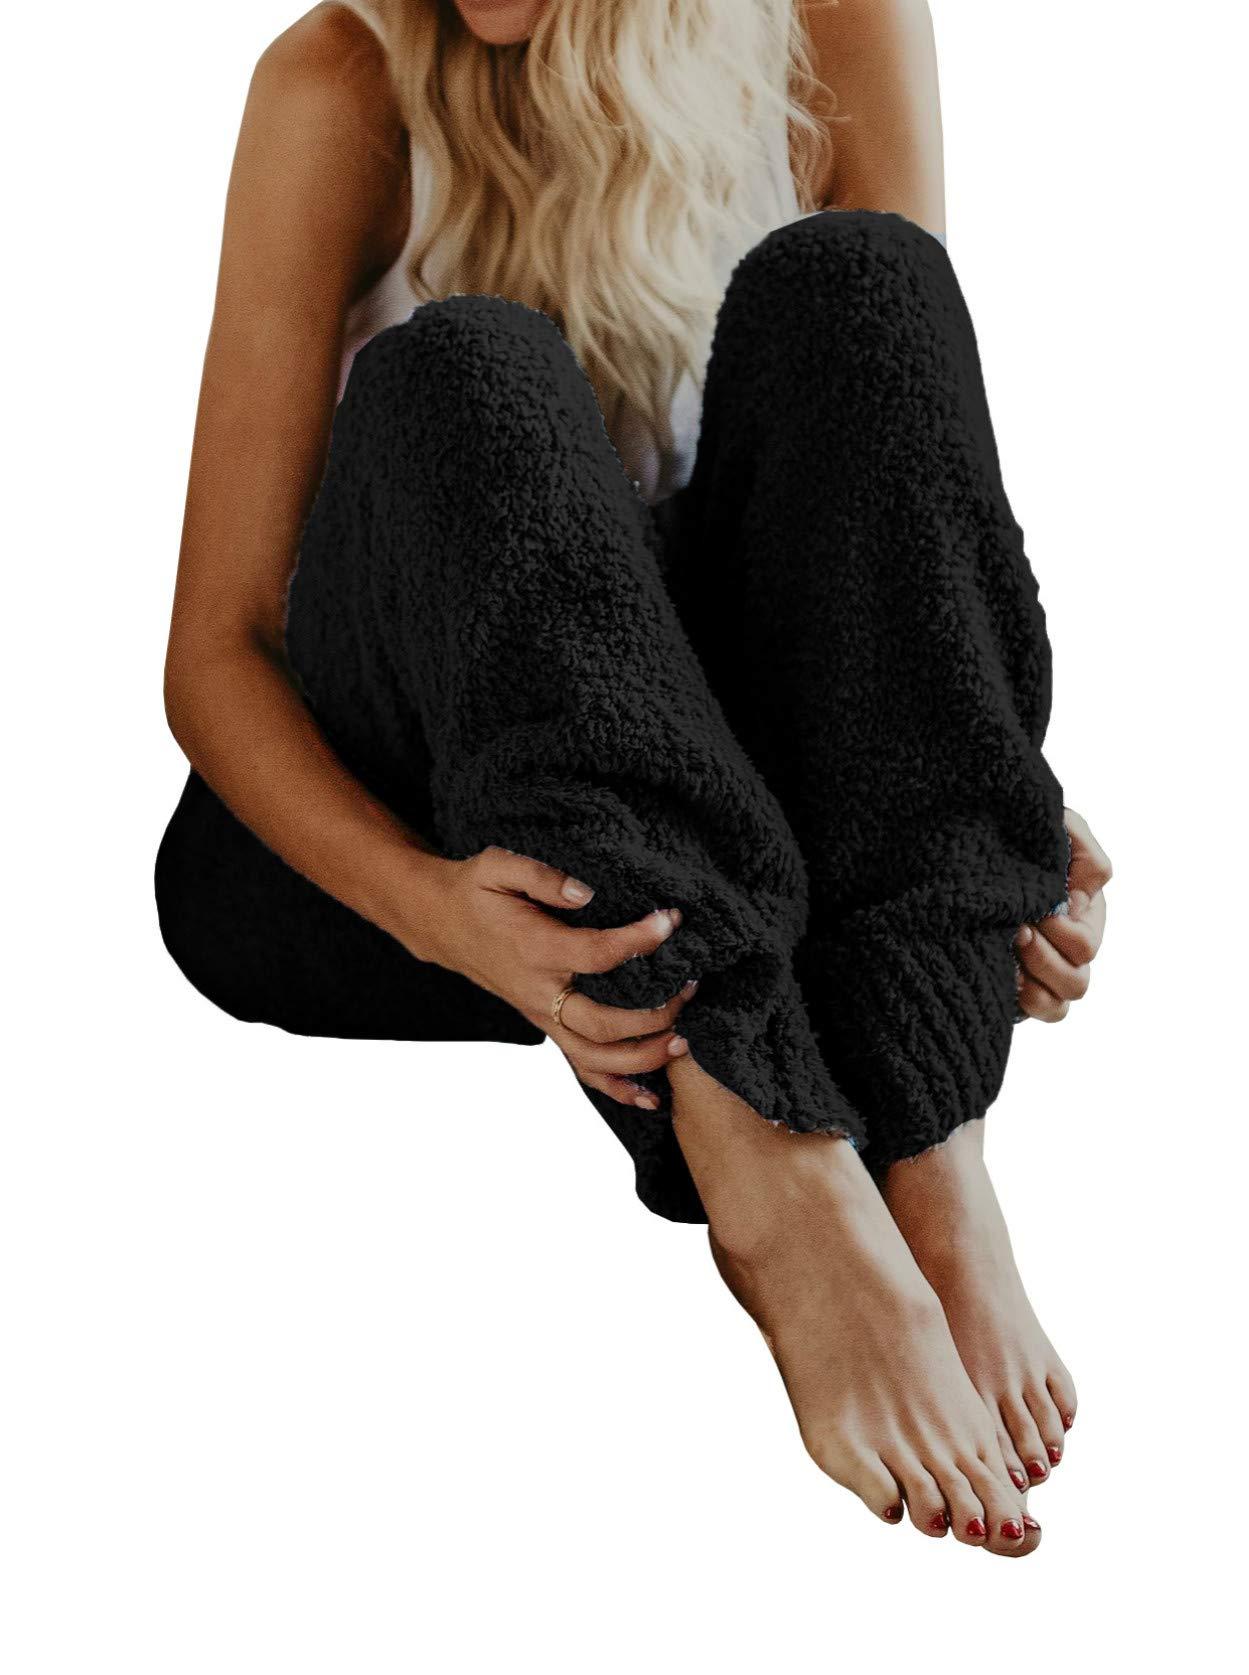 Meilidress Womens Fuzzy Fleece Pajama Pants Casual Lounge Winter Warm Cozy Plush Lounge Sleepwear PJ Bottoms